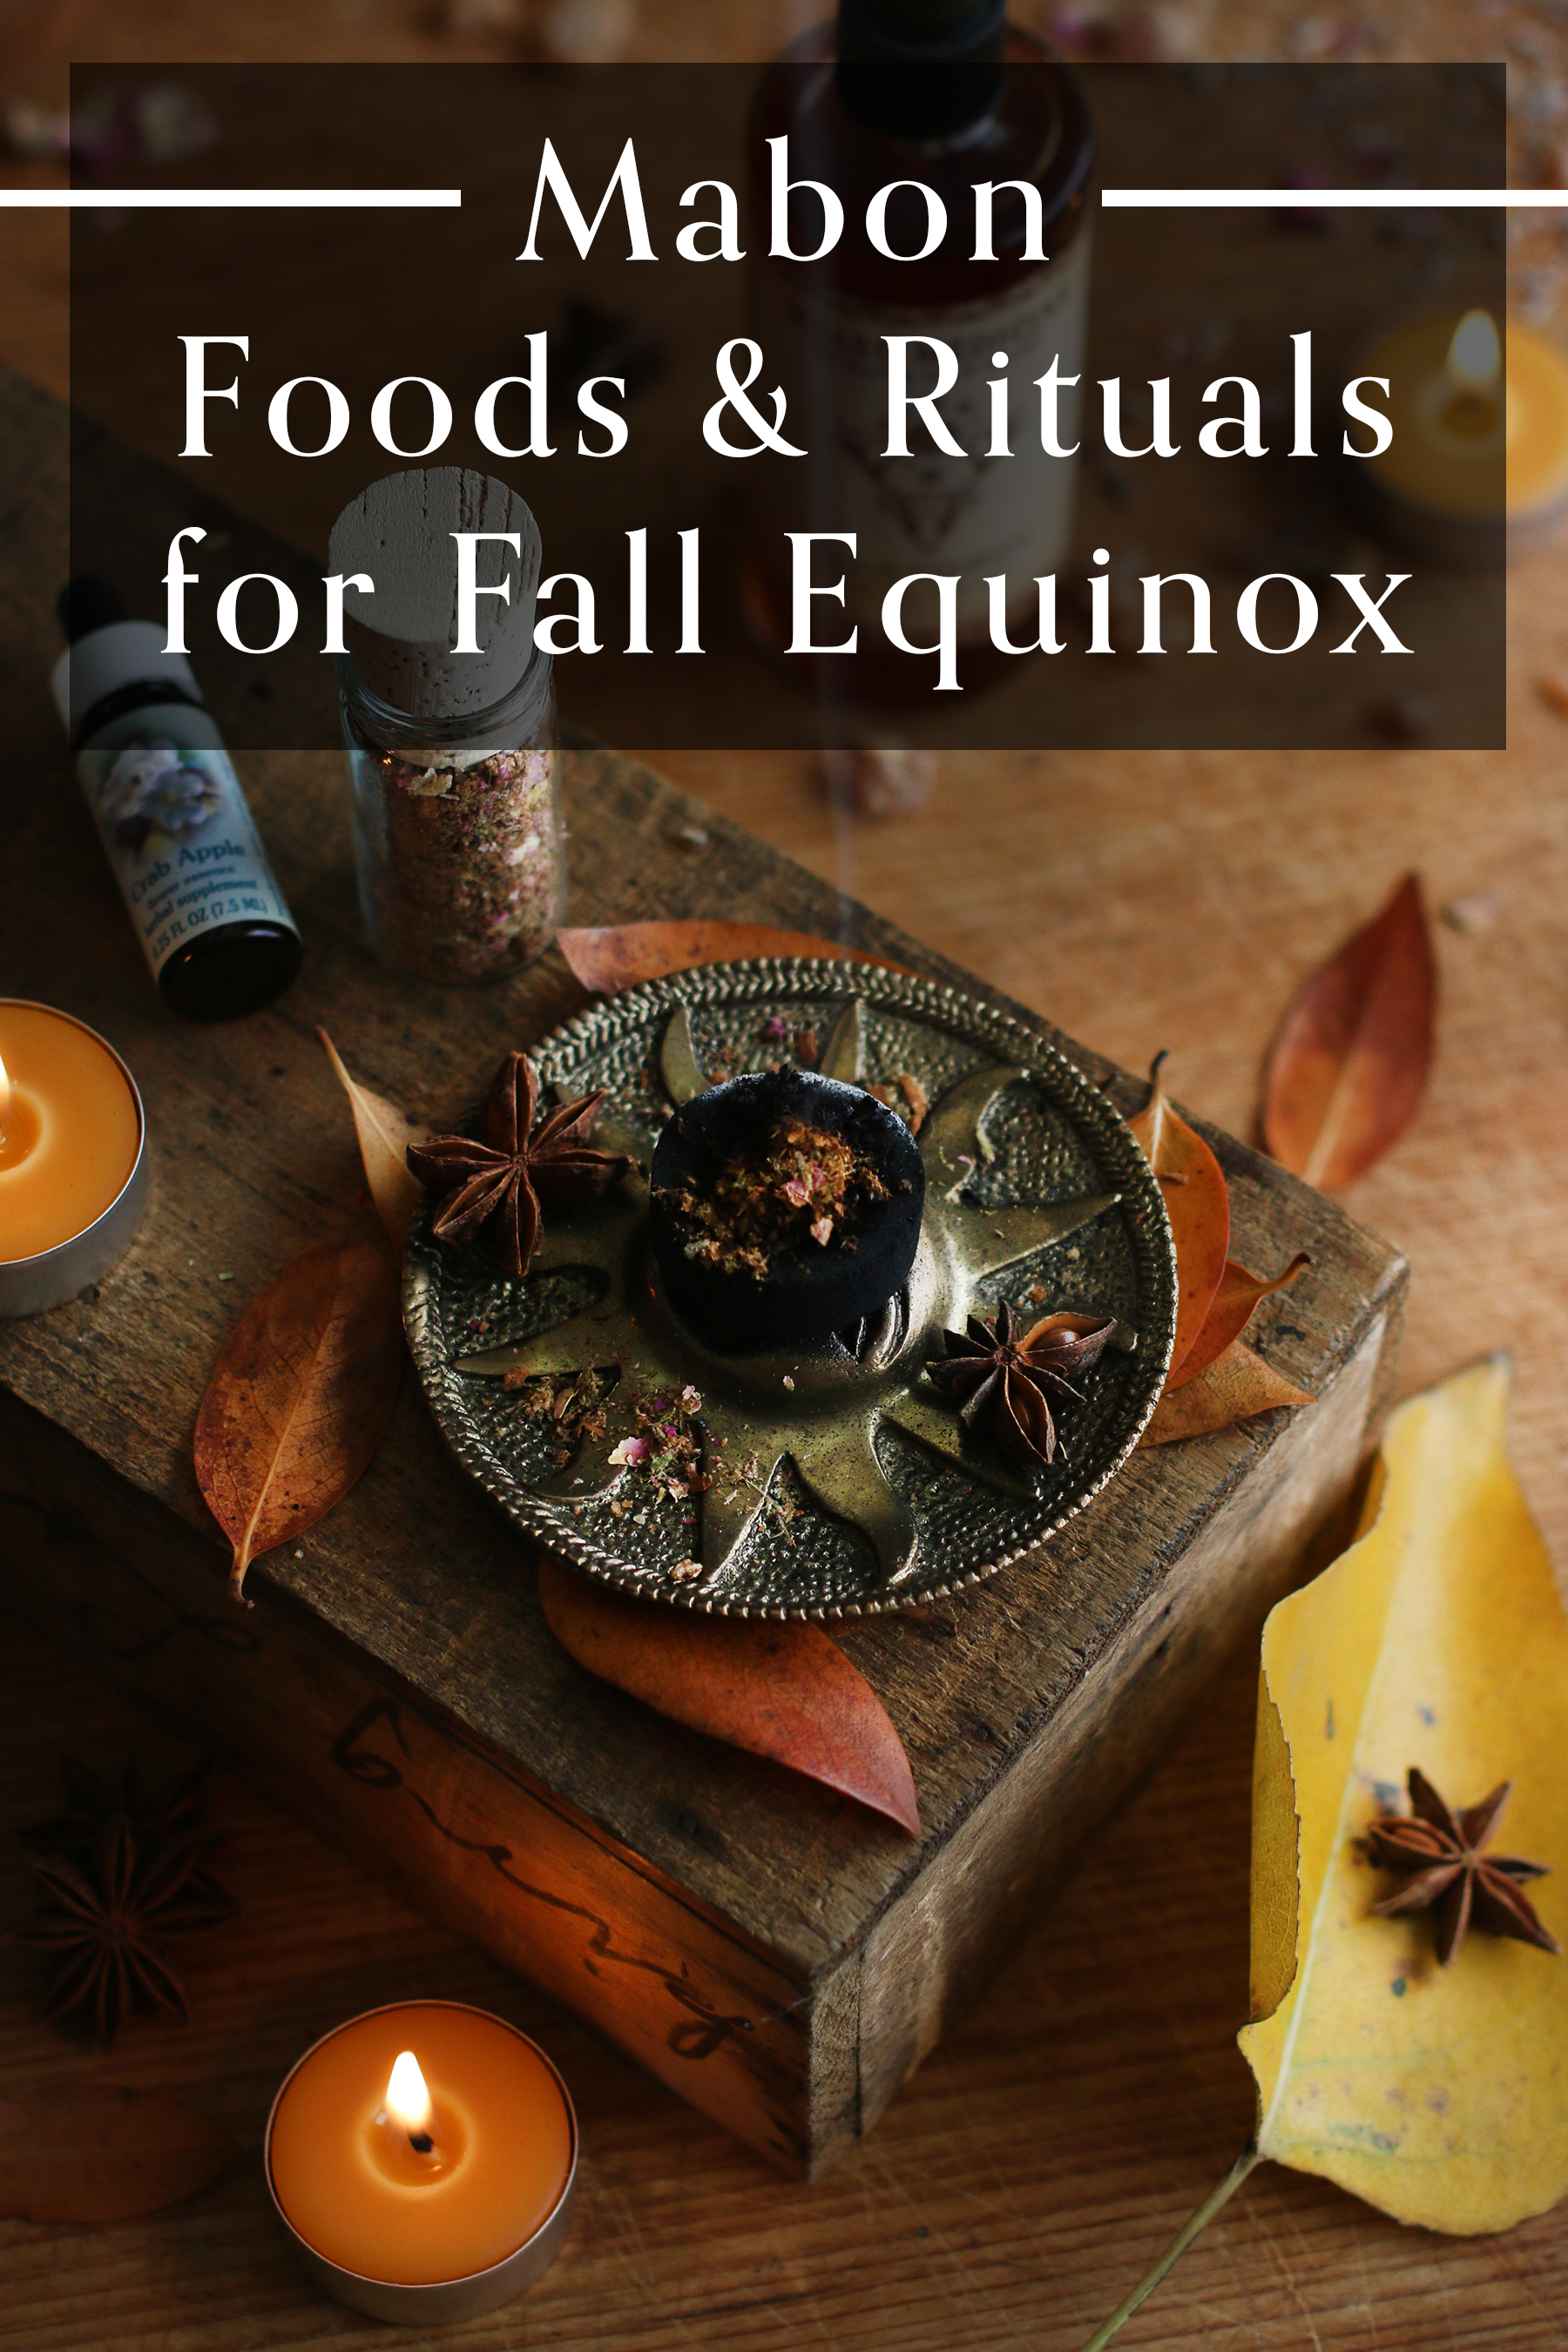 Fall Equinox Rituals Herbs Recipes To Celebrate Mabon Five Flavors Herbs